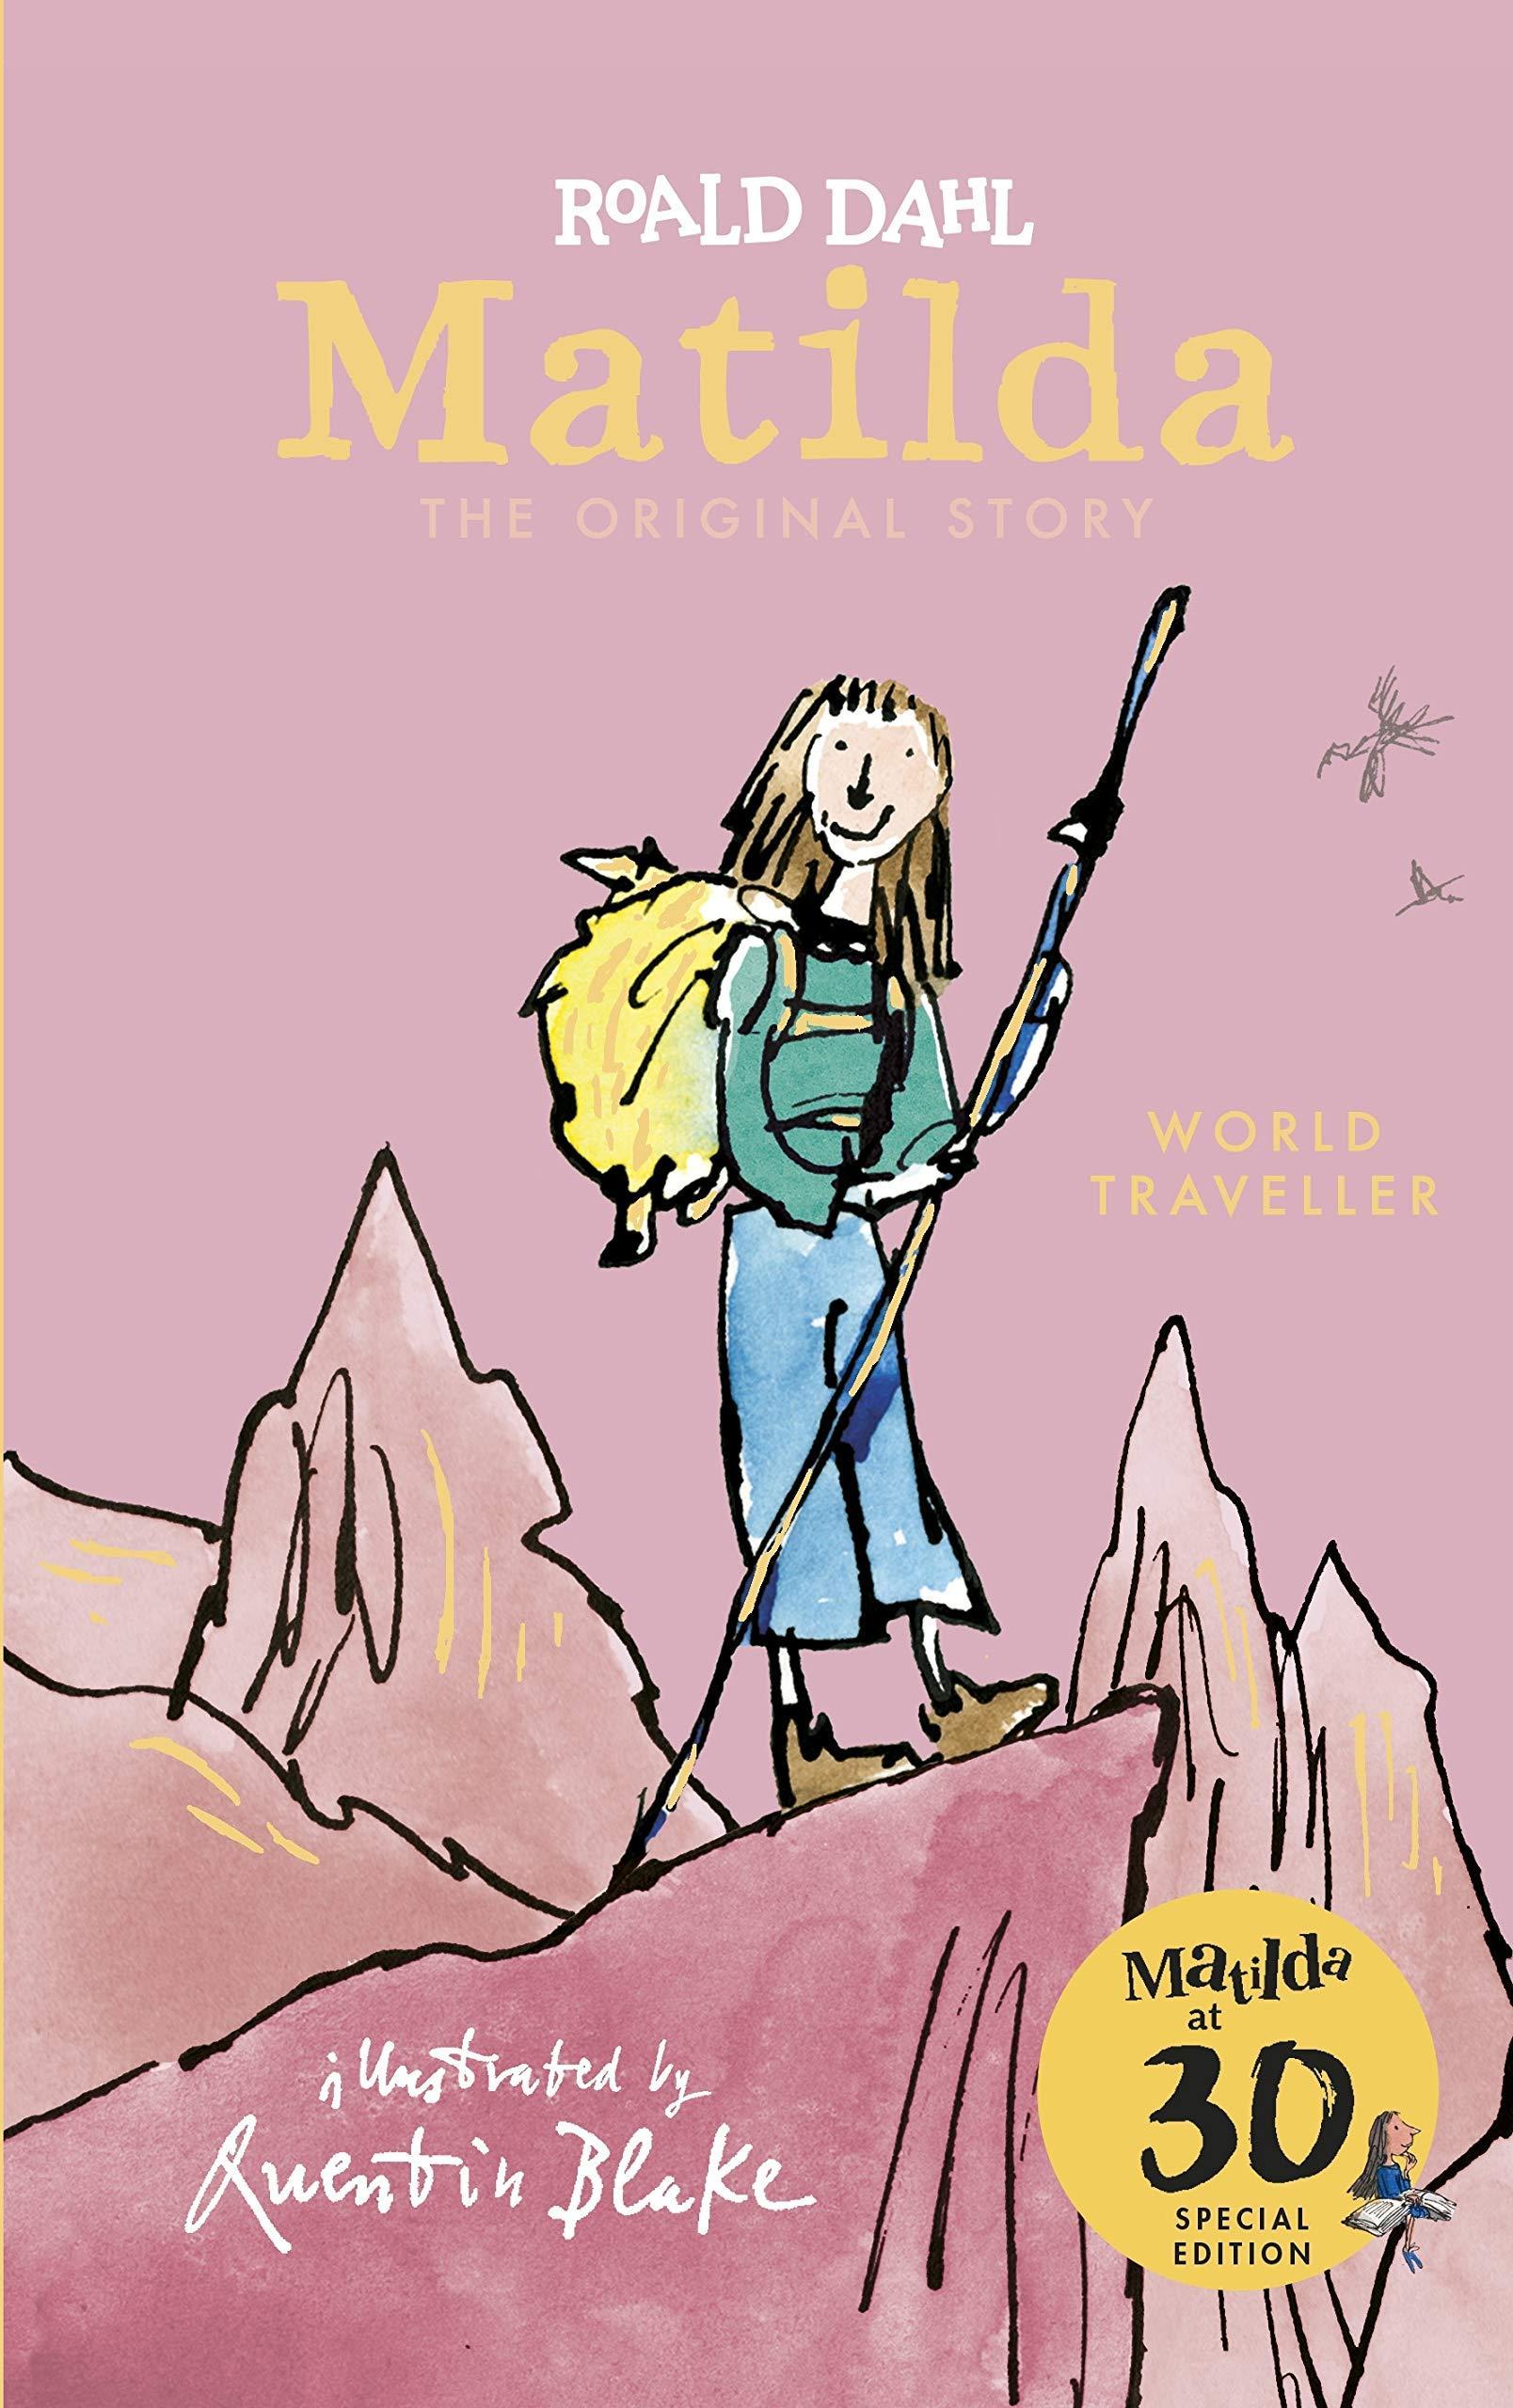 [Roald Dahl] Matilda at 30: World Traveller